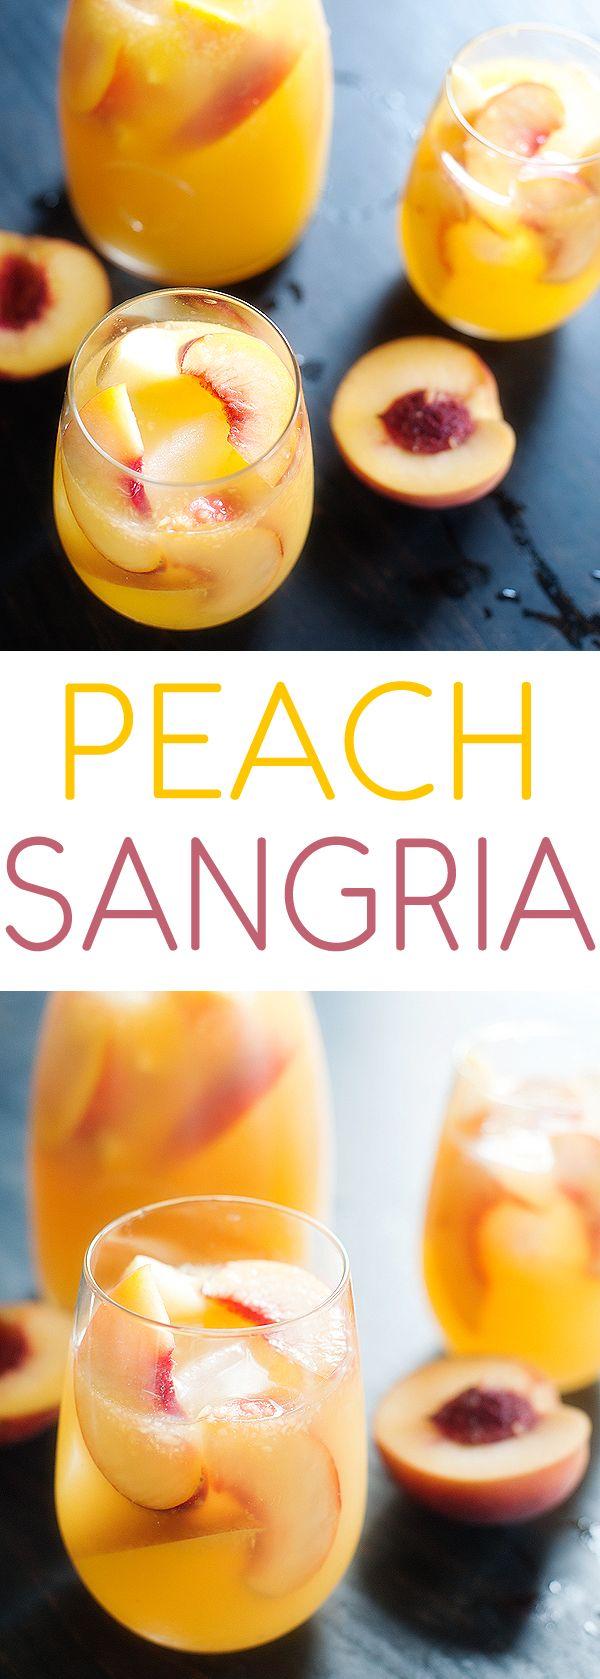 Peach Sangria More